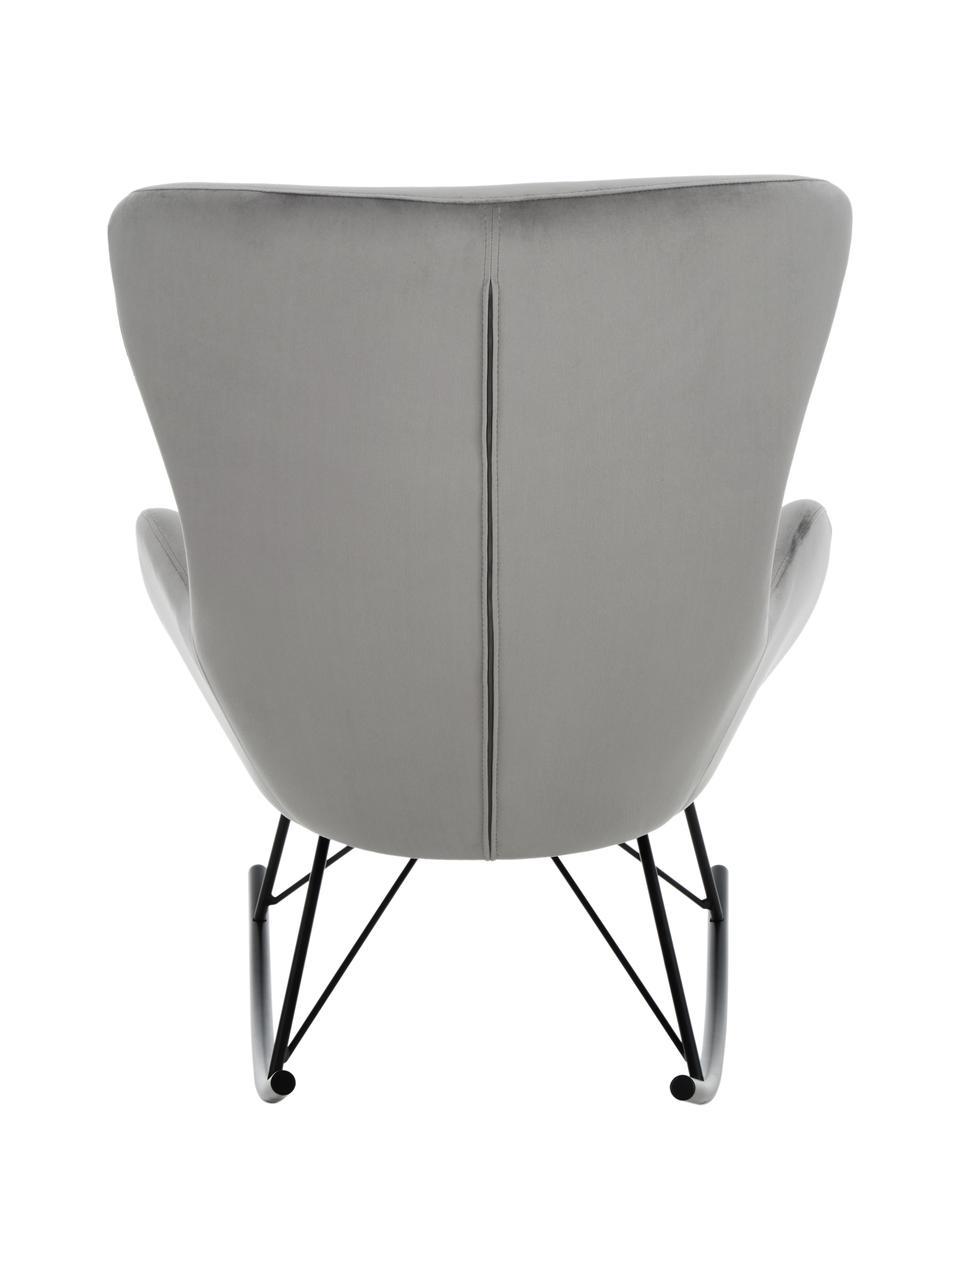 Samt-Schaukelstuhl Wing in Grau, Bezug: Samt (Polyester) Der Bezu, Gestell: Metall, galvanisiert, Samt Grau, Schwarz, B 66 x T 102 cm